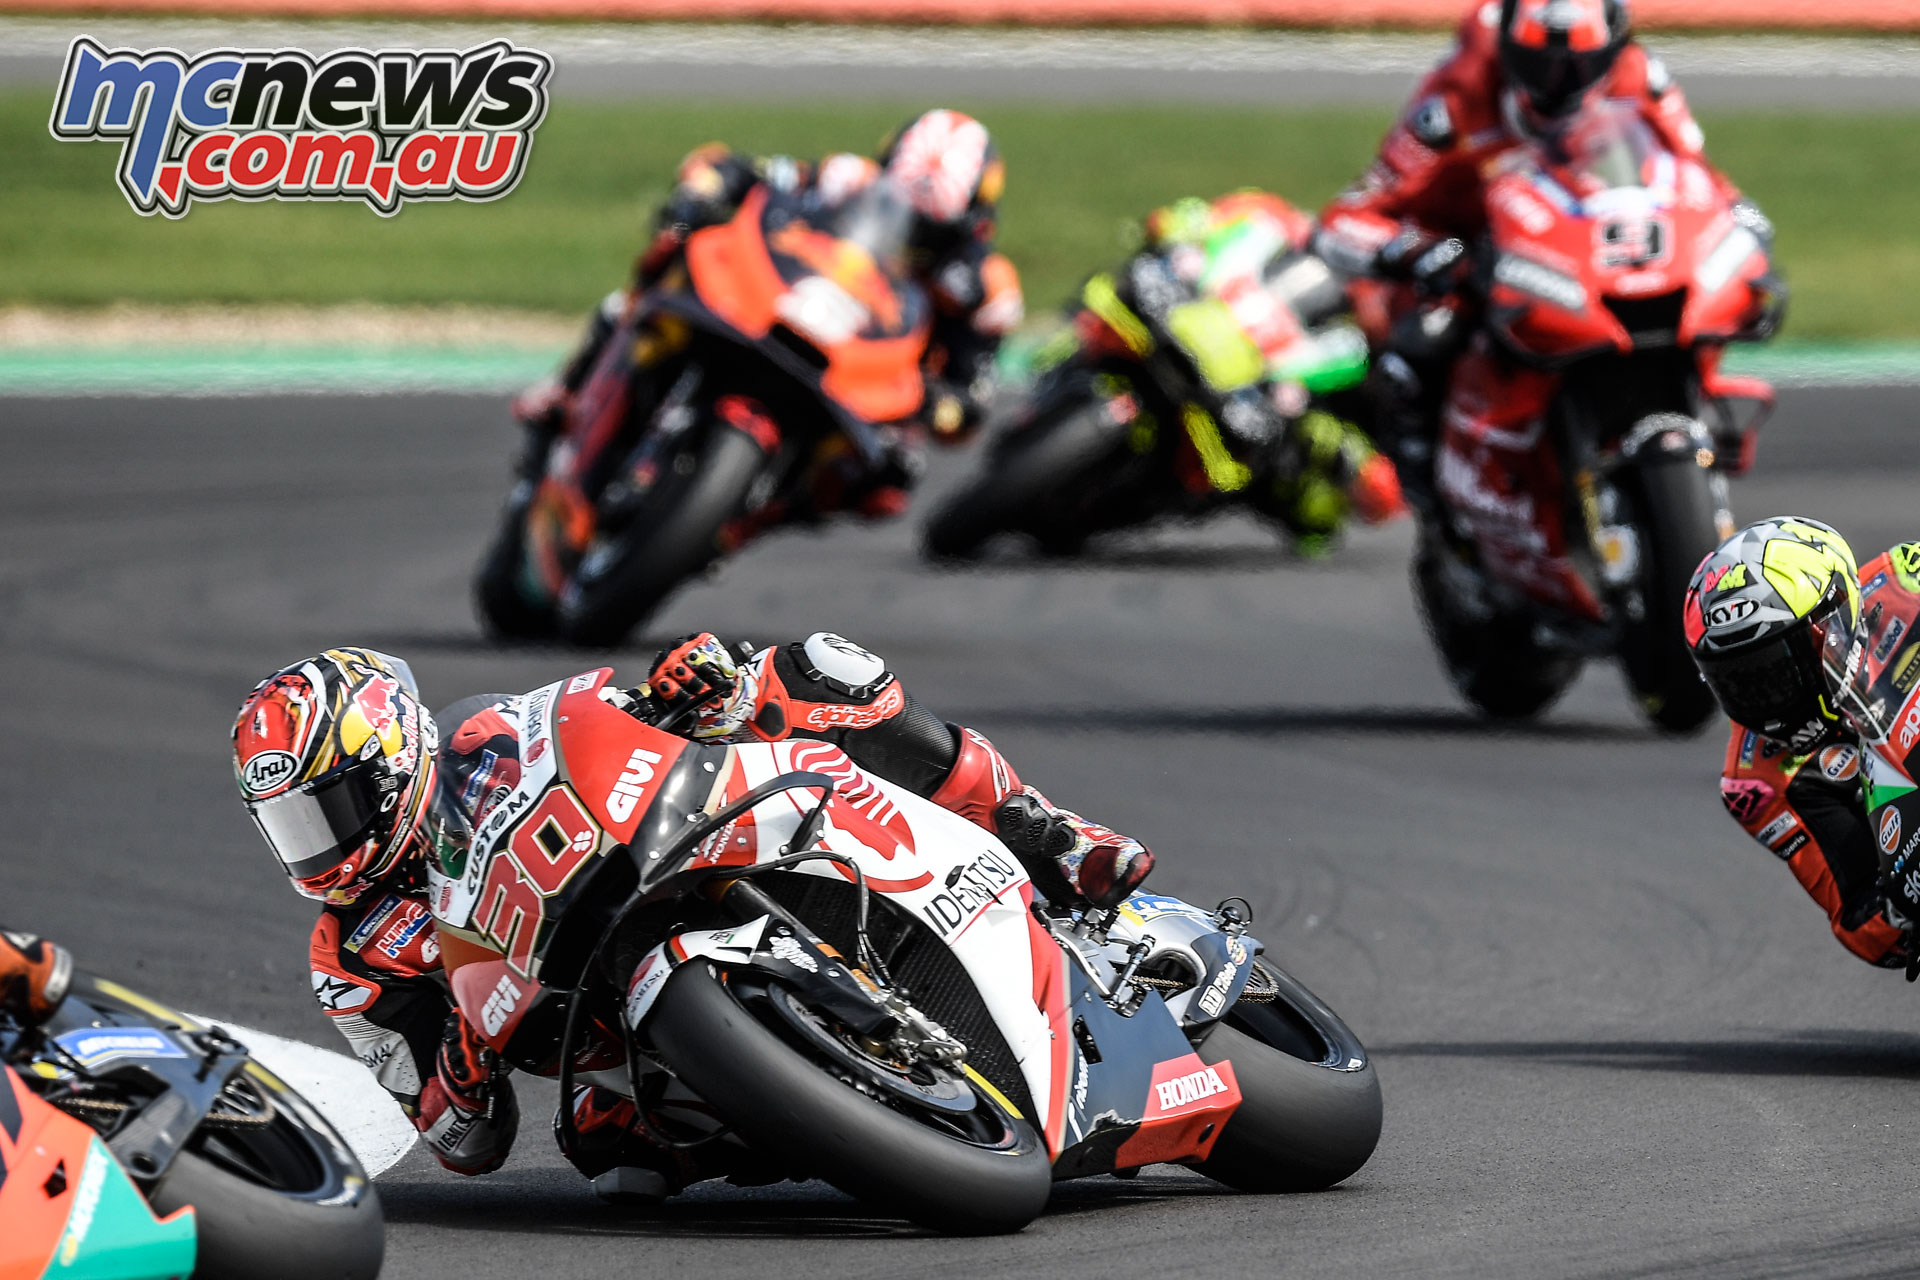 MotoGP Rnd Silverstone Nakagami G